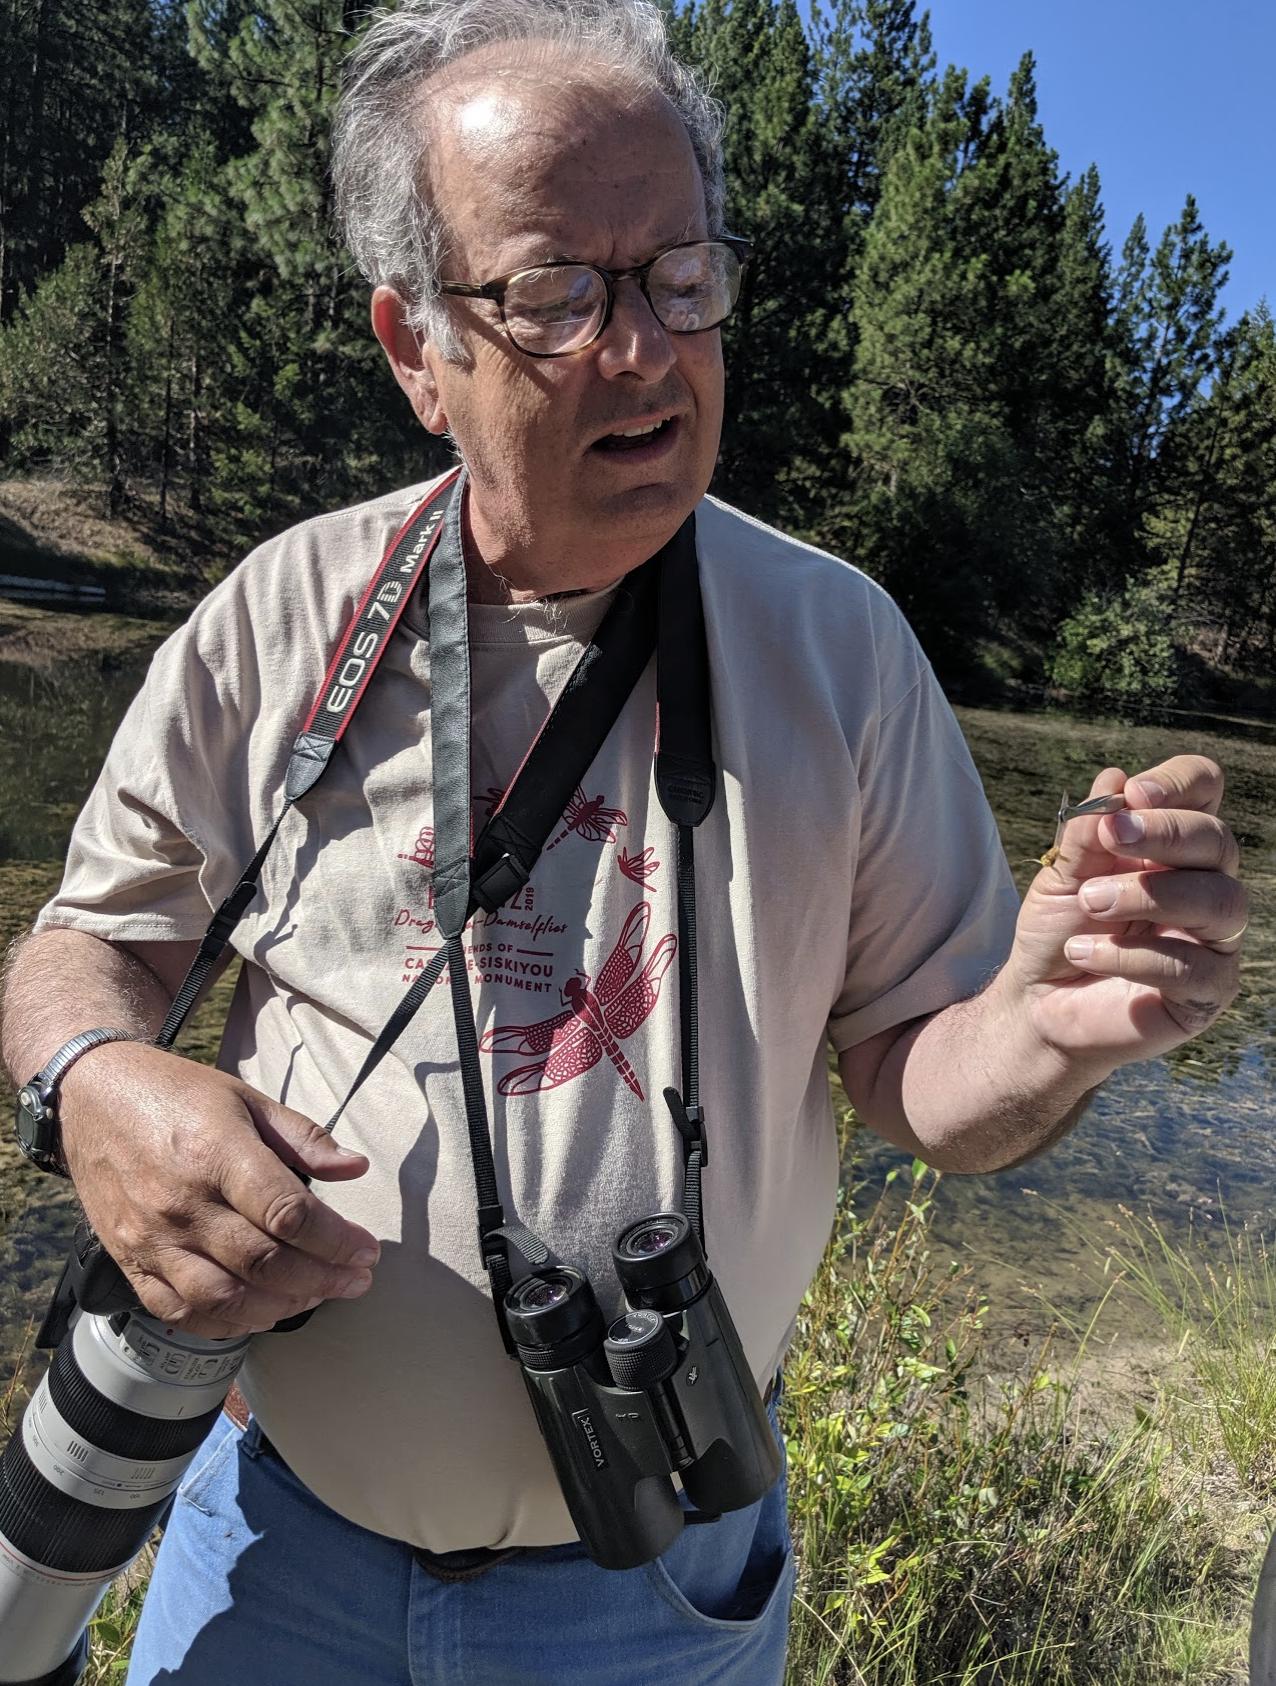 Norm Barrett, BioBlitz organizer, identifies a dragonfly in hand. Photo by Shannon Browne.